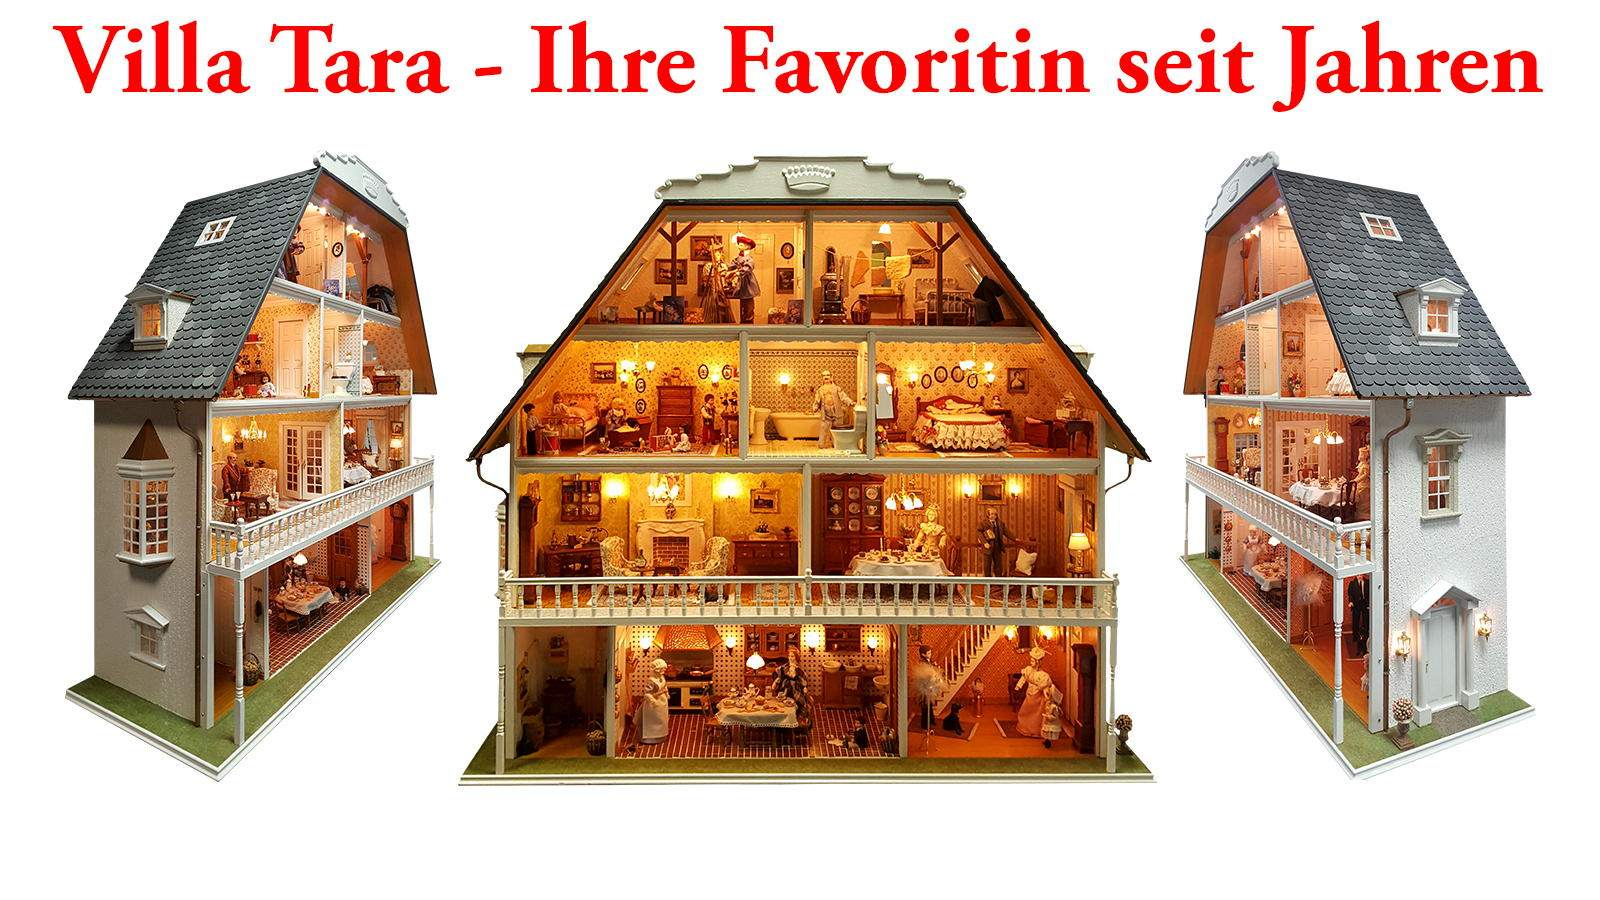 35 Jahre Mini Mundus Miniatur- und Puppenhäuser!